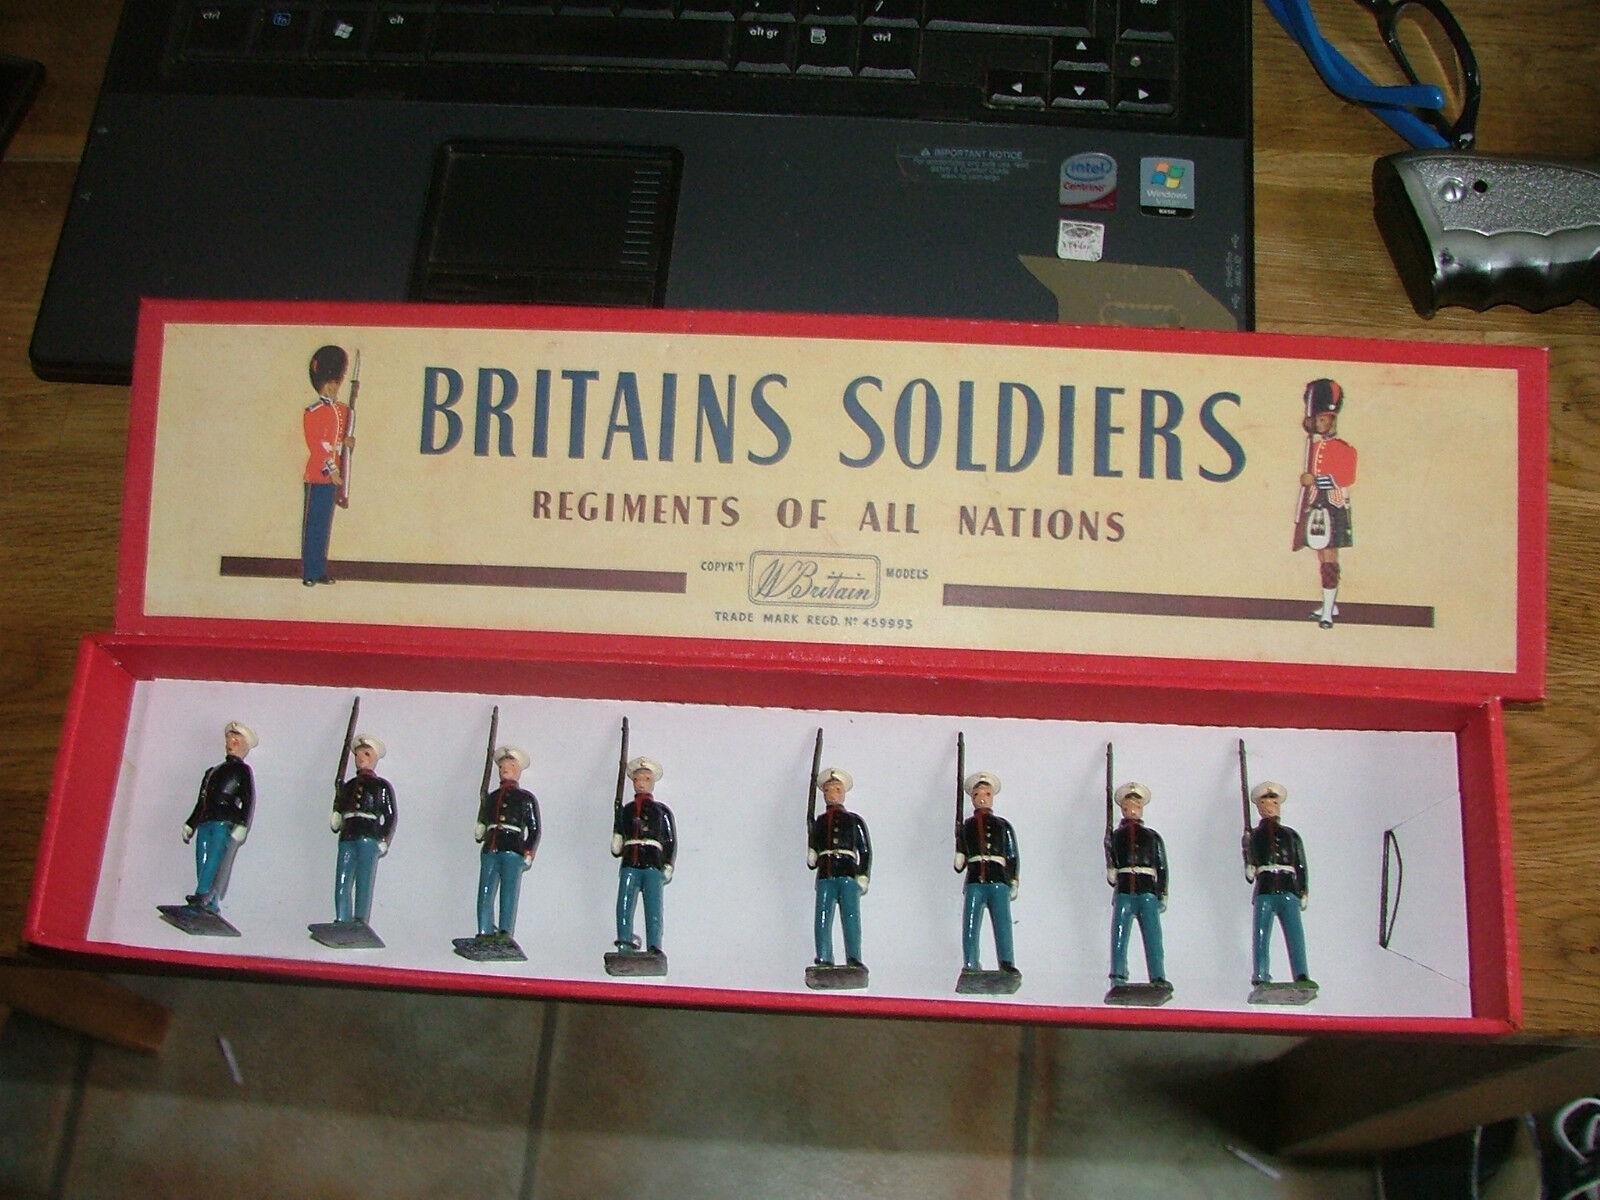 Britannici 228 Pugned Set Lead U.S. Marines a Slope USMC MINT IN STcorrereG scatola